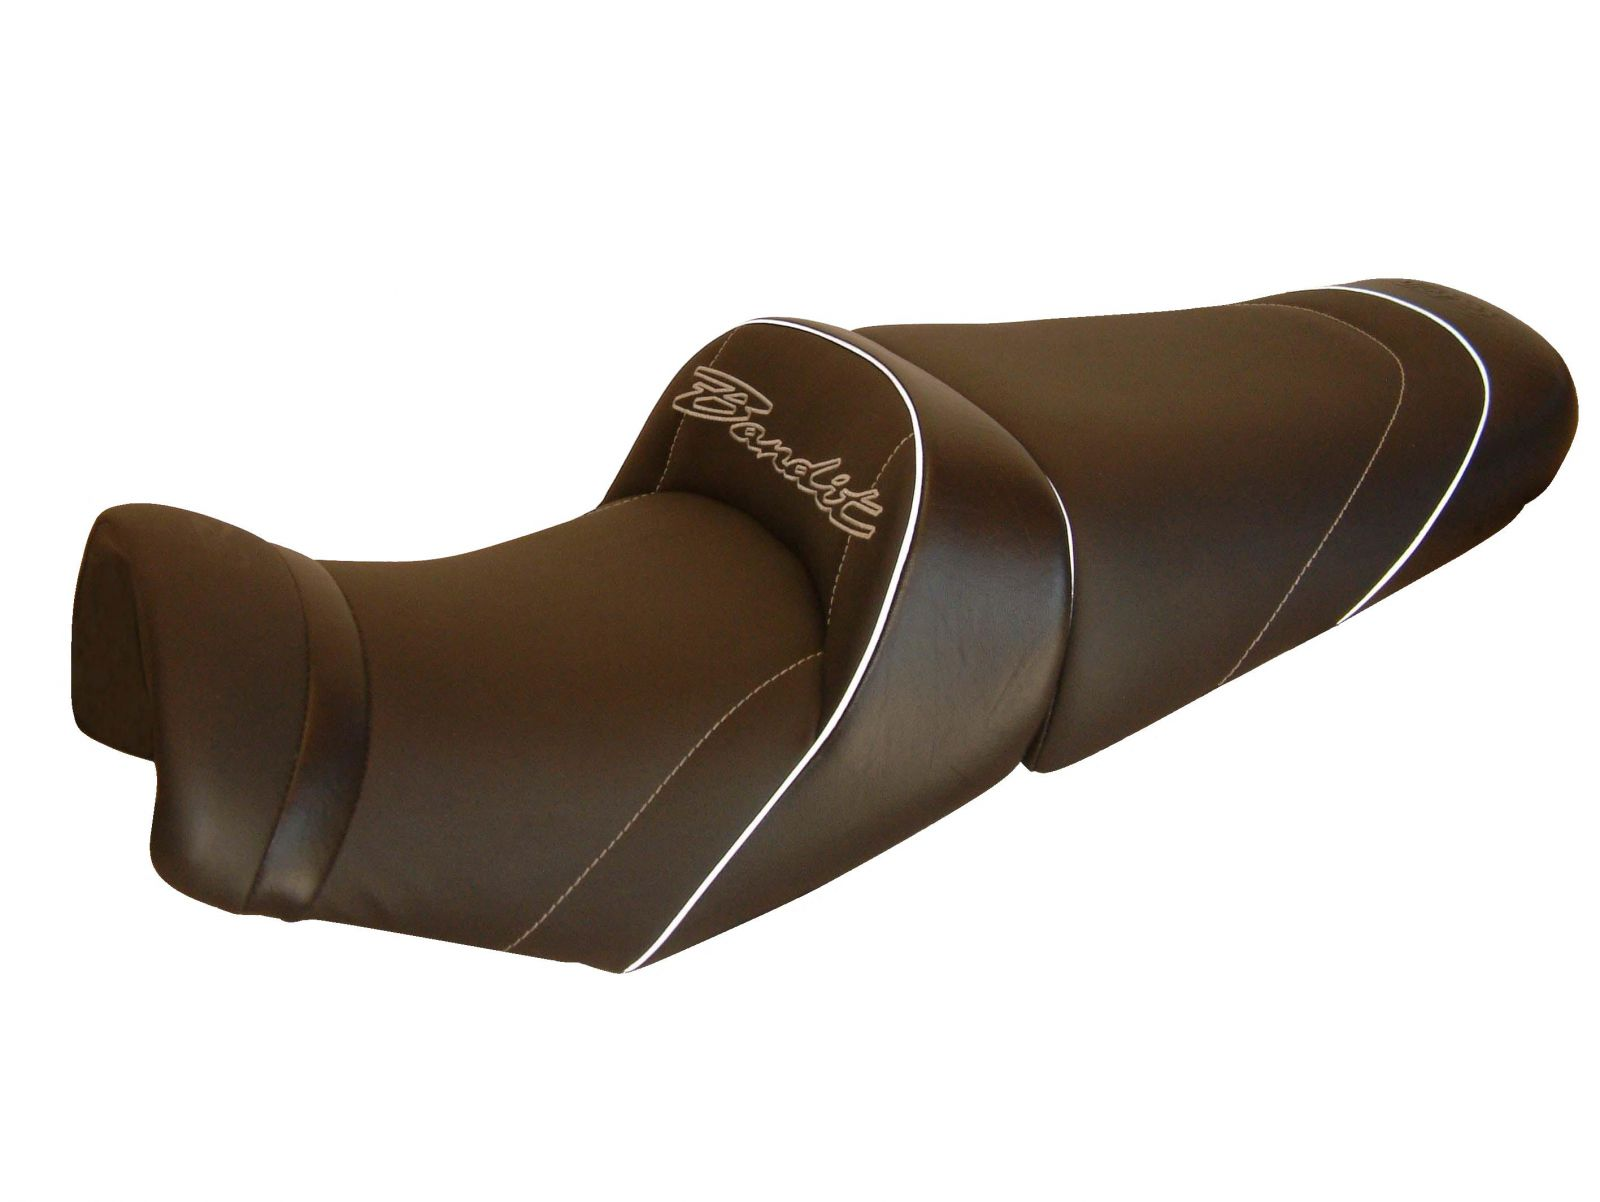 selle grand confort sgc3294 suzuki bandit 650 2010 tarifs pour france. Black Bedroom Furniture Sets. Home Design Ideas